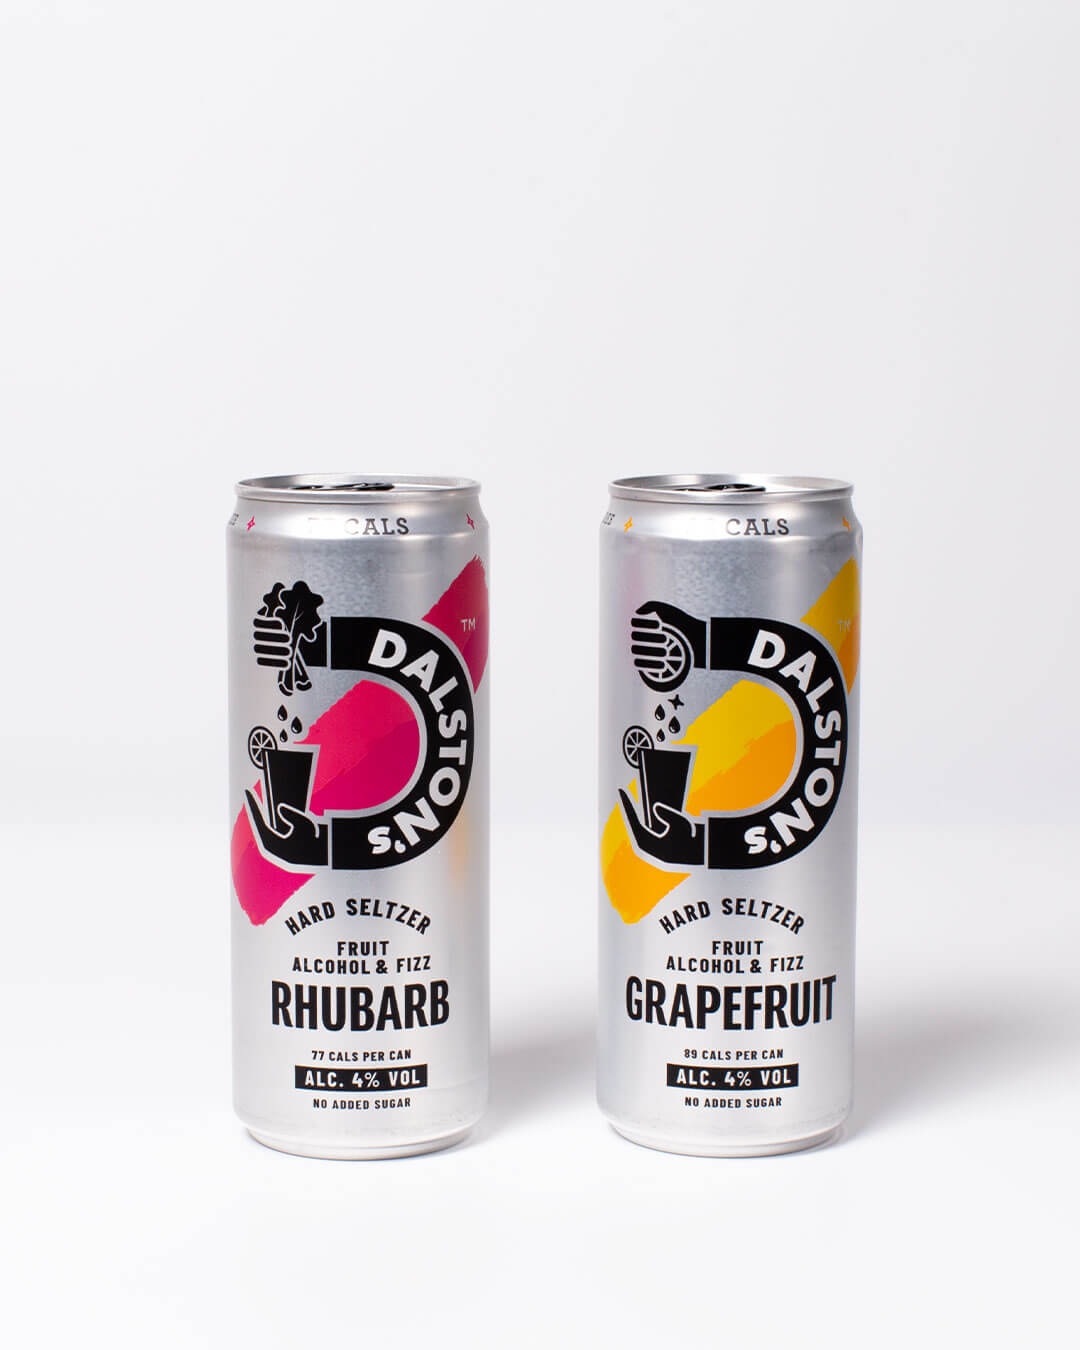 Dalston's rhubarb & grapefruit hard seltzer cans